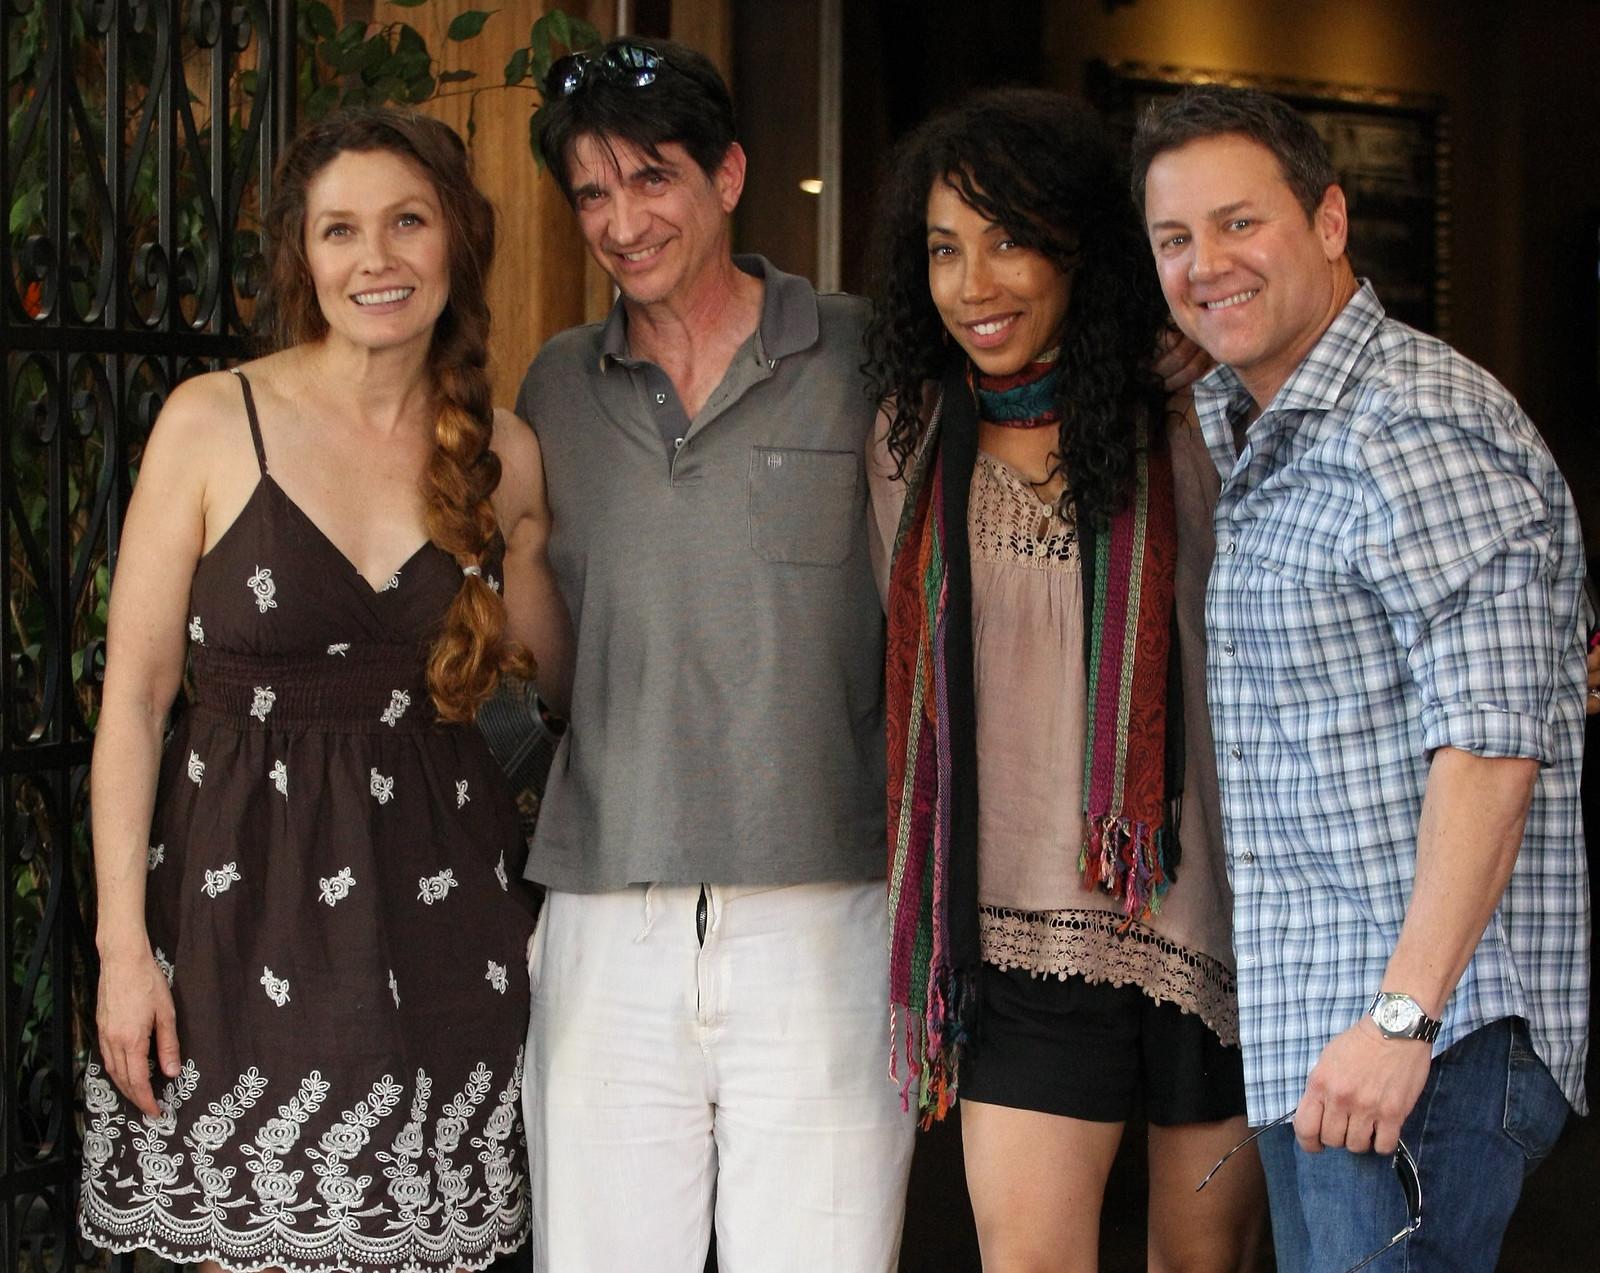 24 tv show cast members - Zoe american horror story style